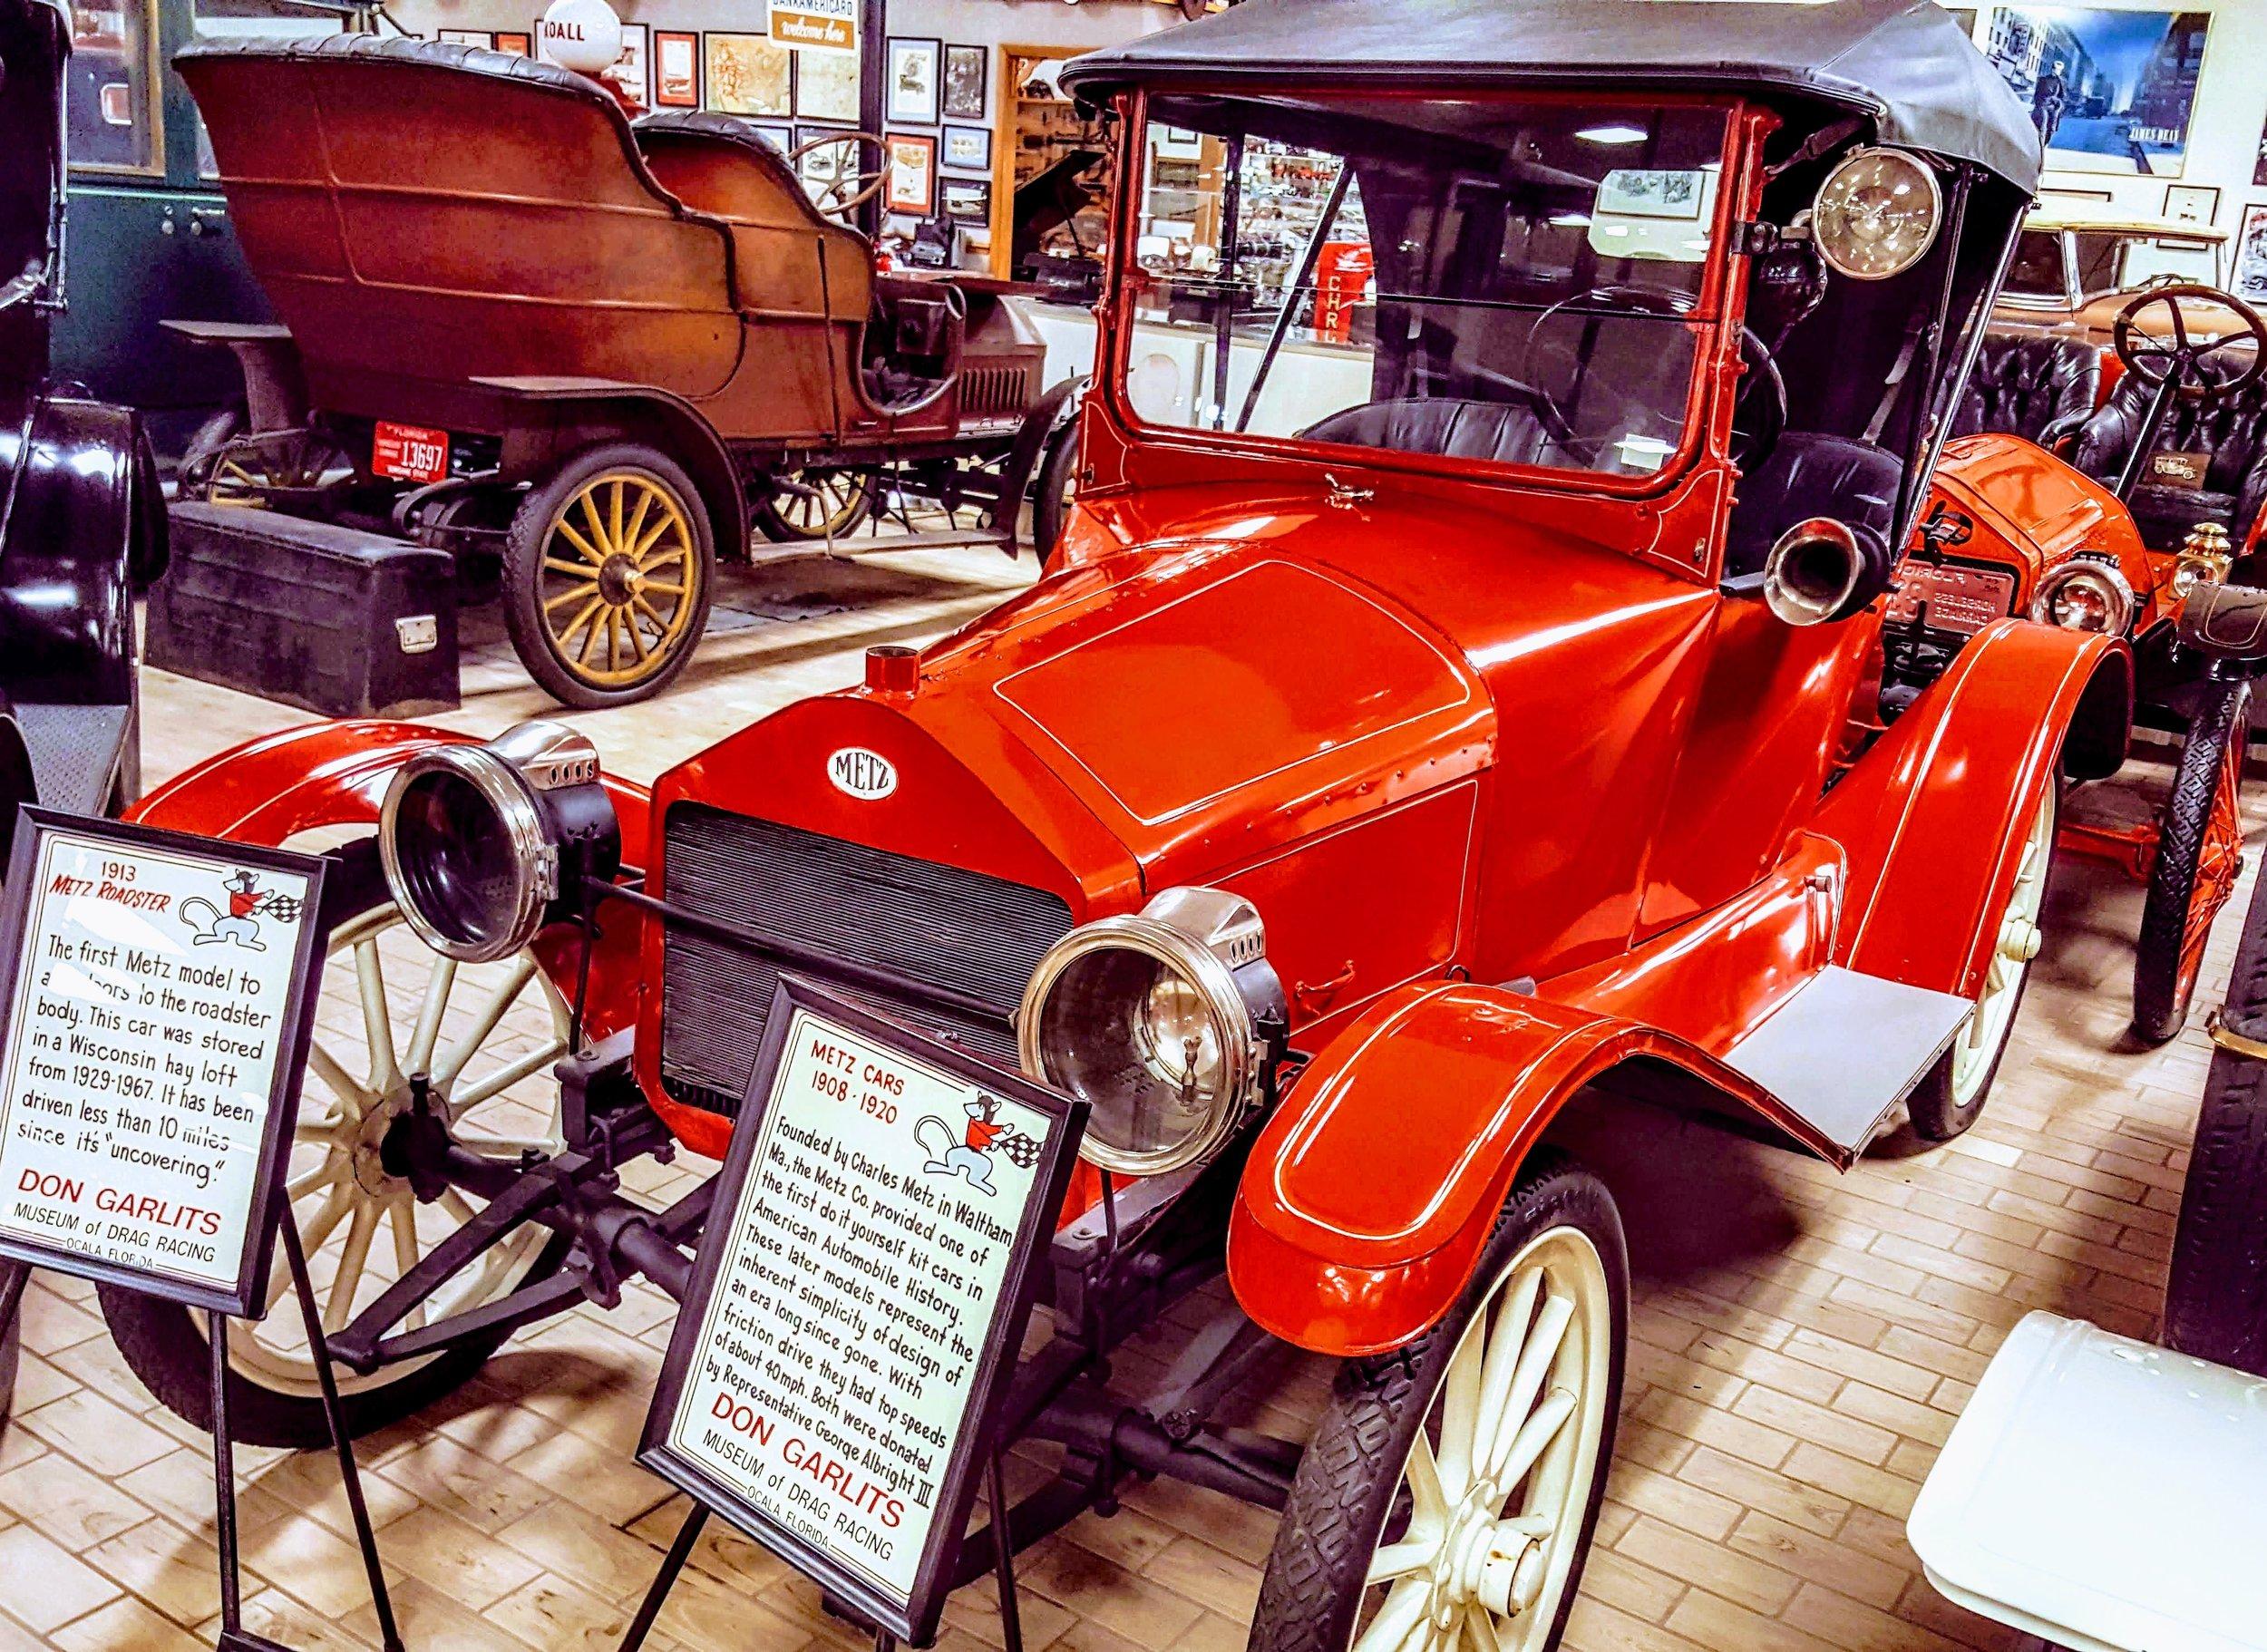 1913 Metz Roadster at the Don Garlit's Museum of Dragon Racing